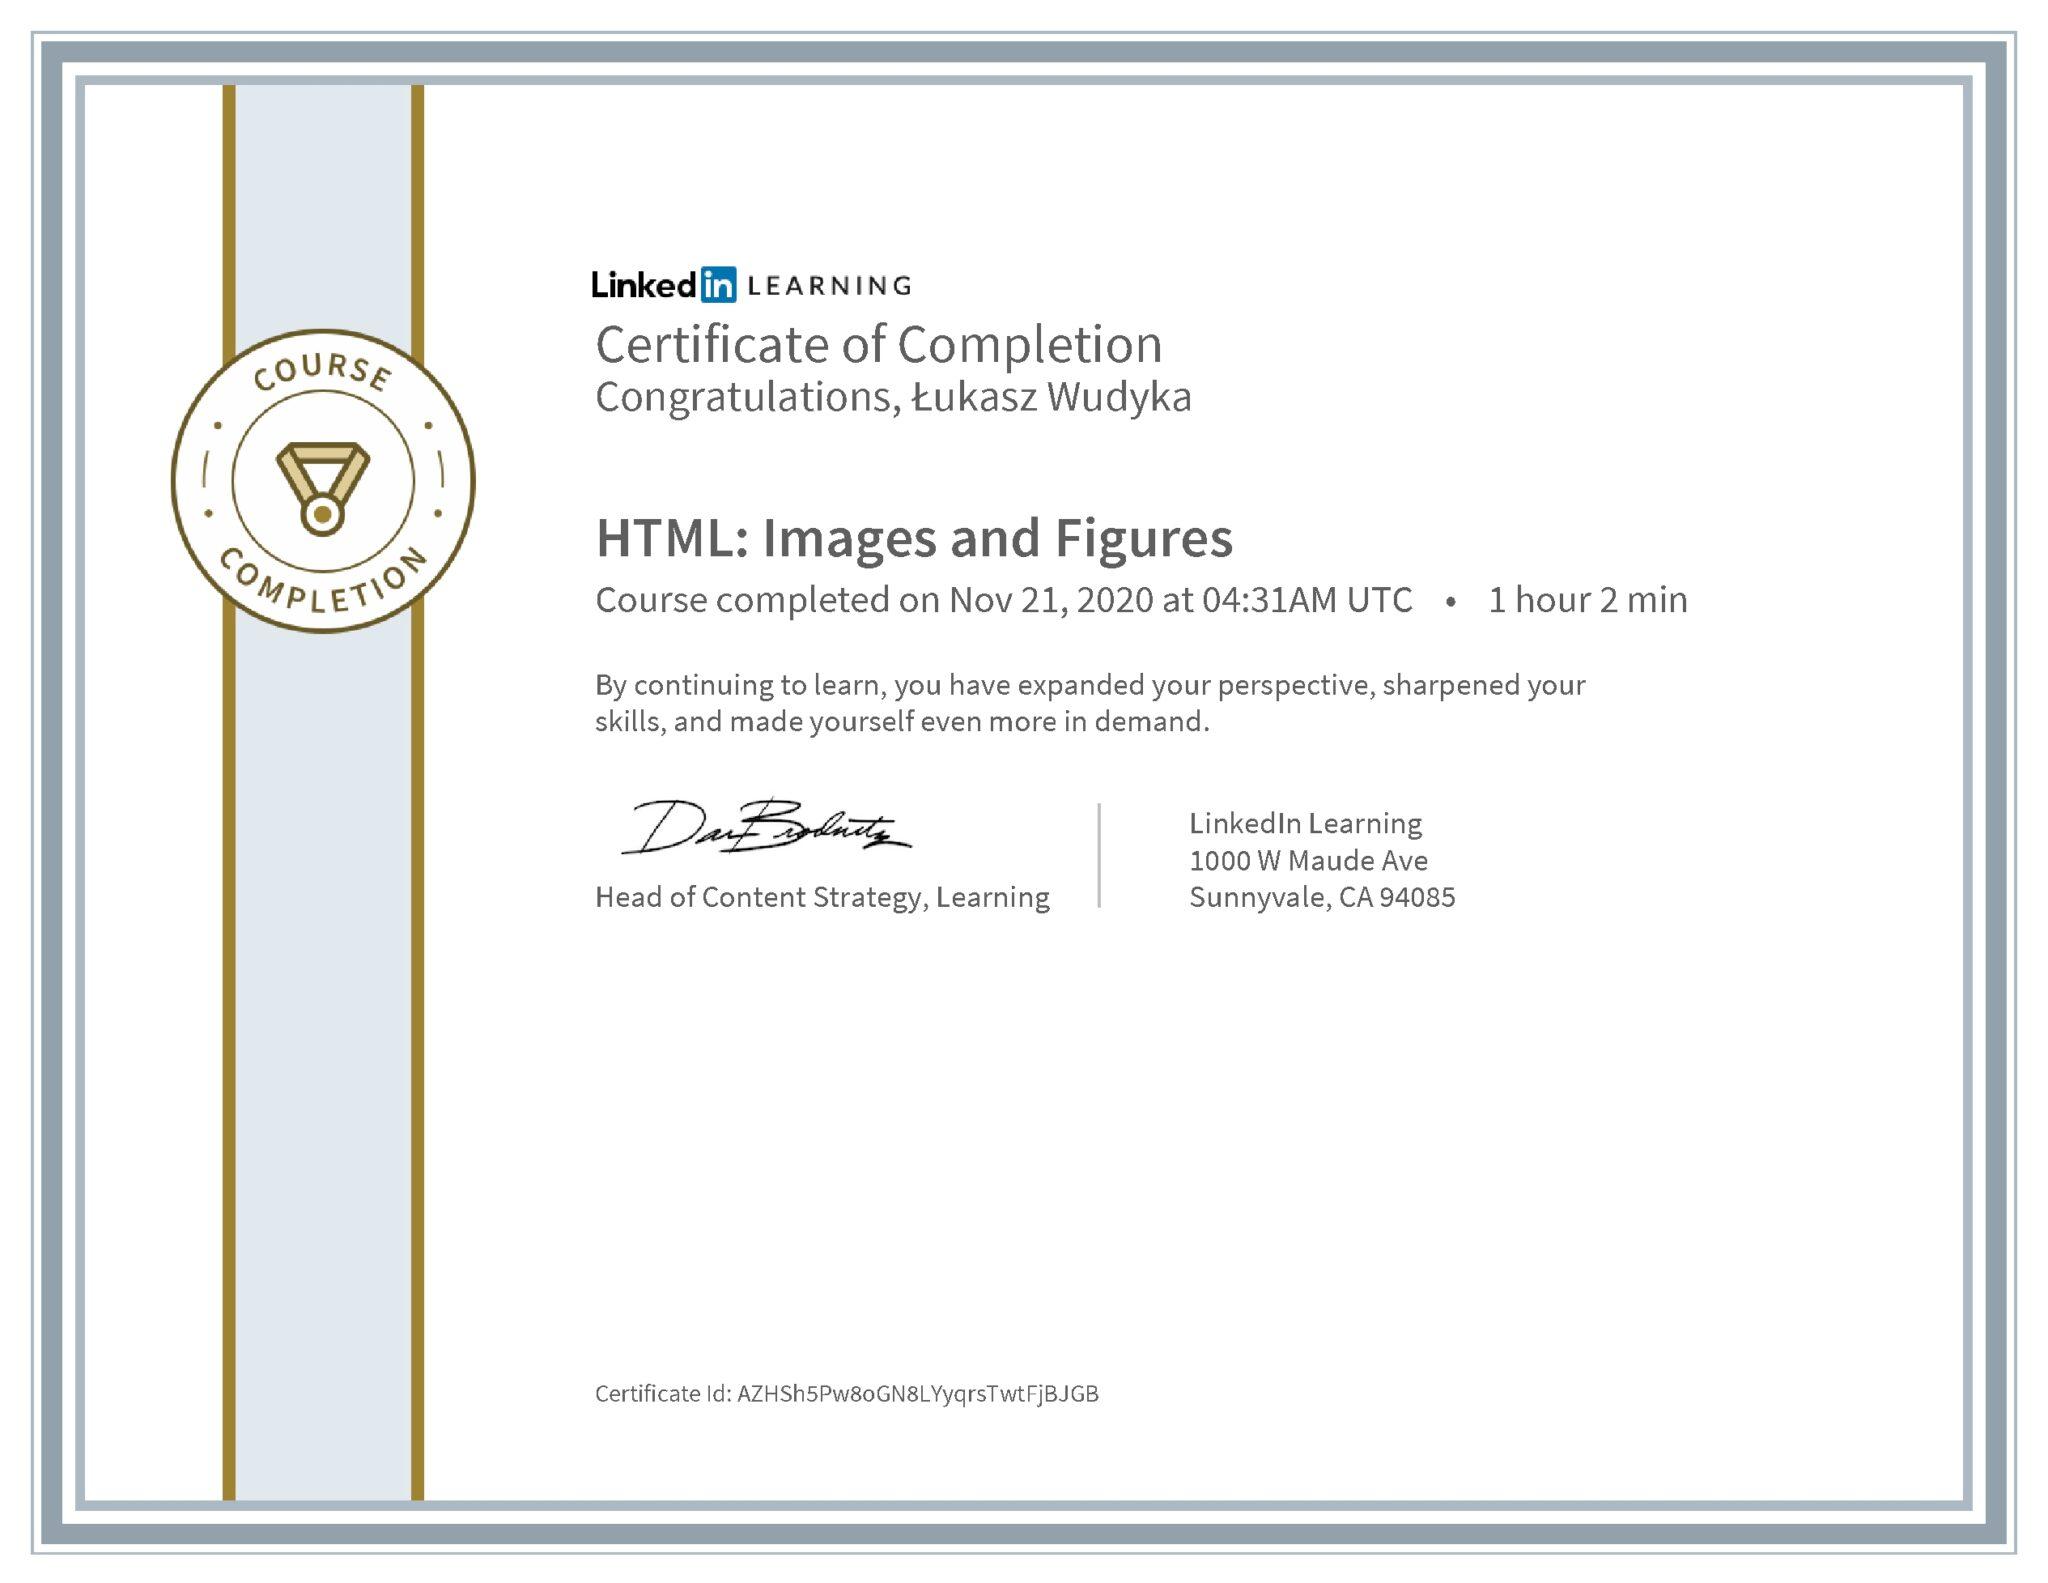 Łukasz Wudyka certyfikat LinkedIn HTML: Images and Figures